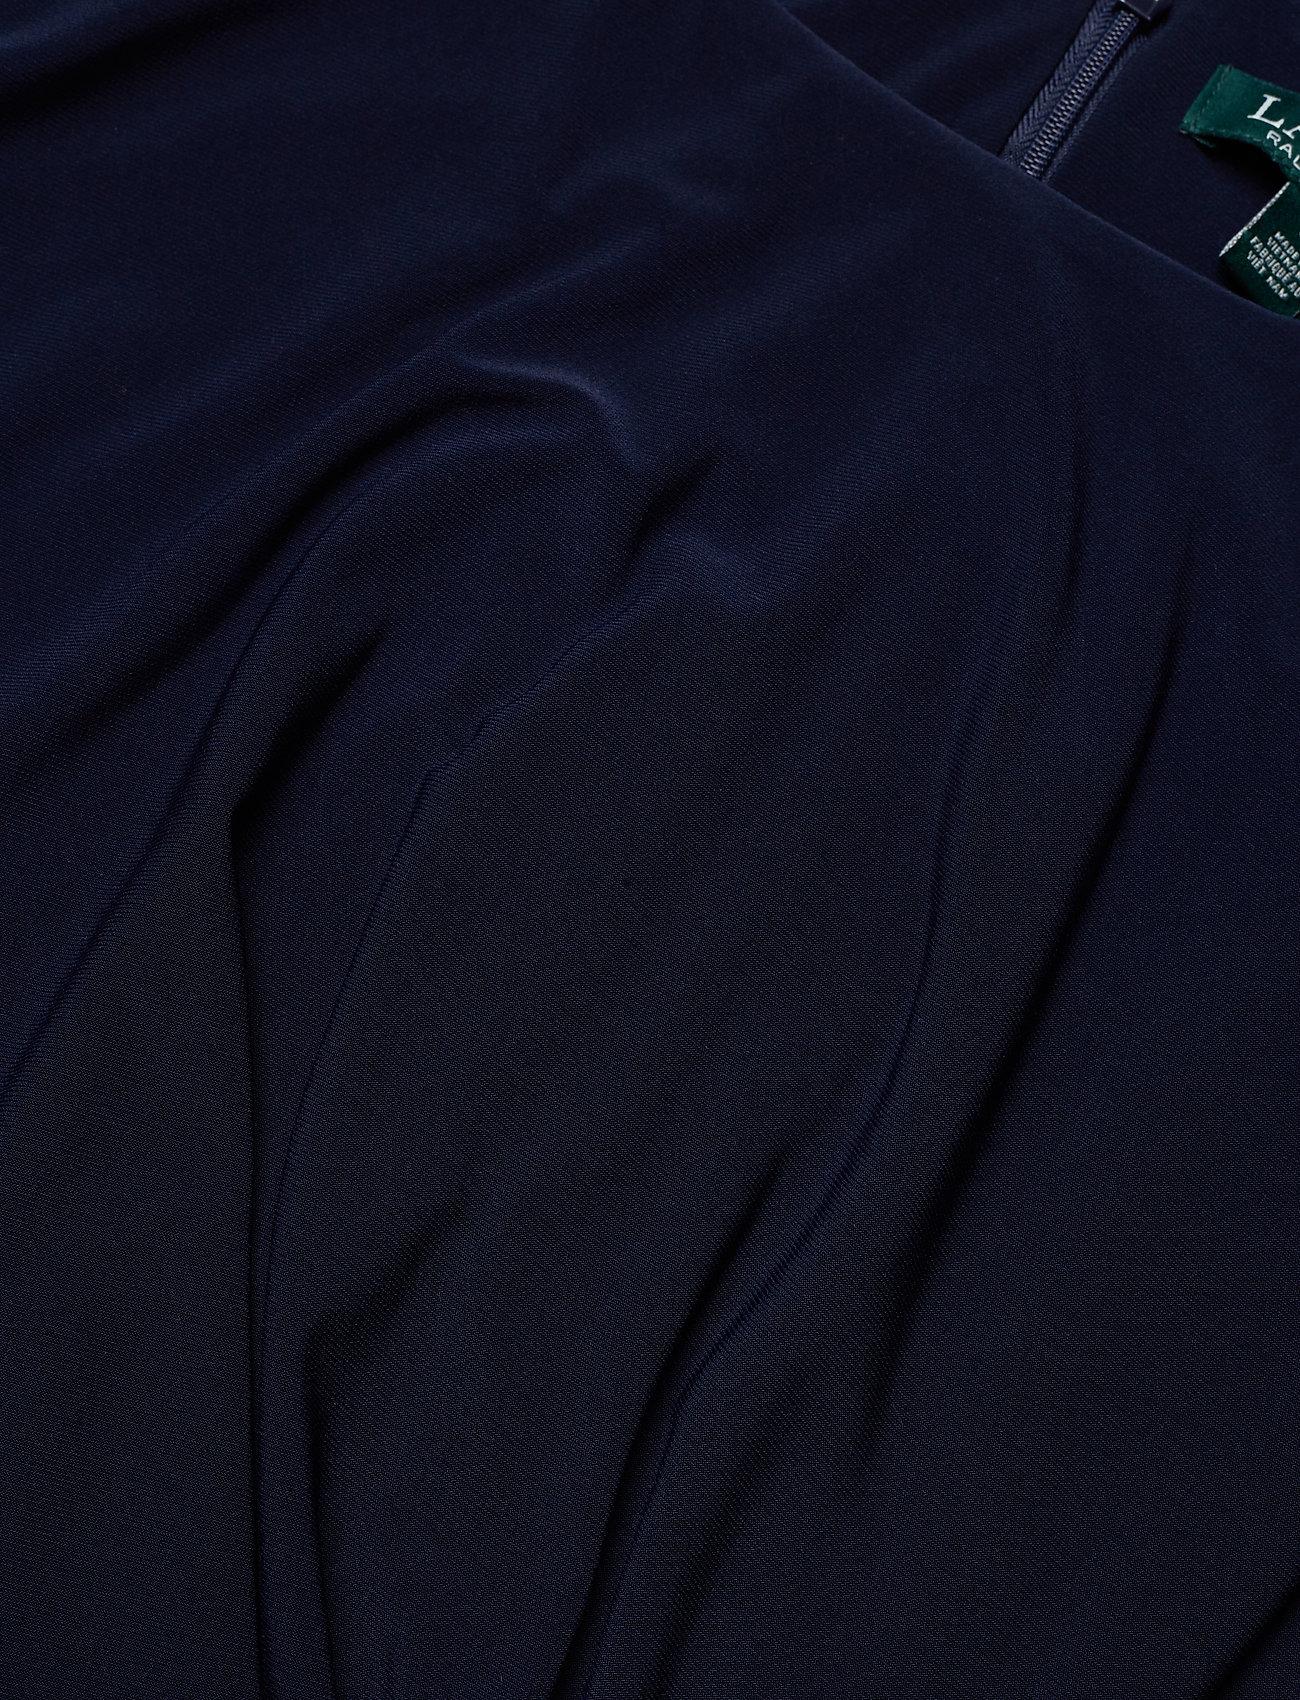 Classic Mj-dress (Lighthouse Navy) (87.45 €) - Lauren Ralph Lauren j08i1hTD